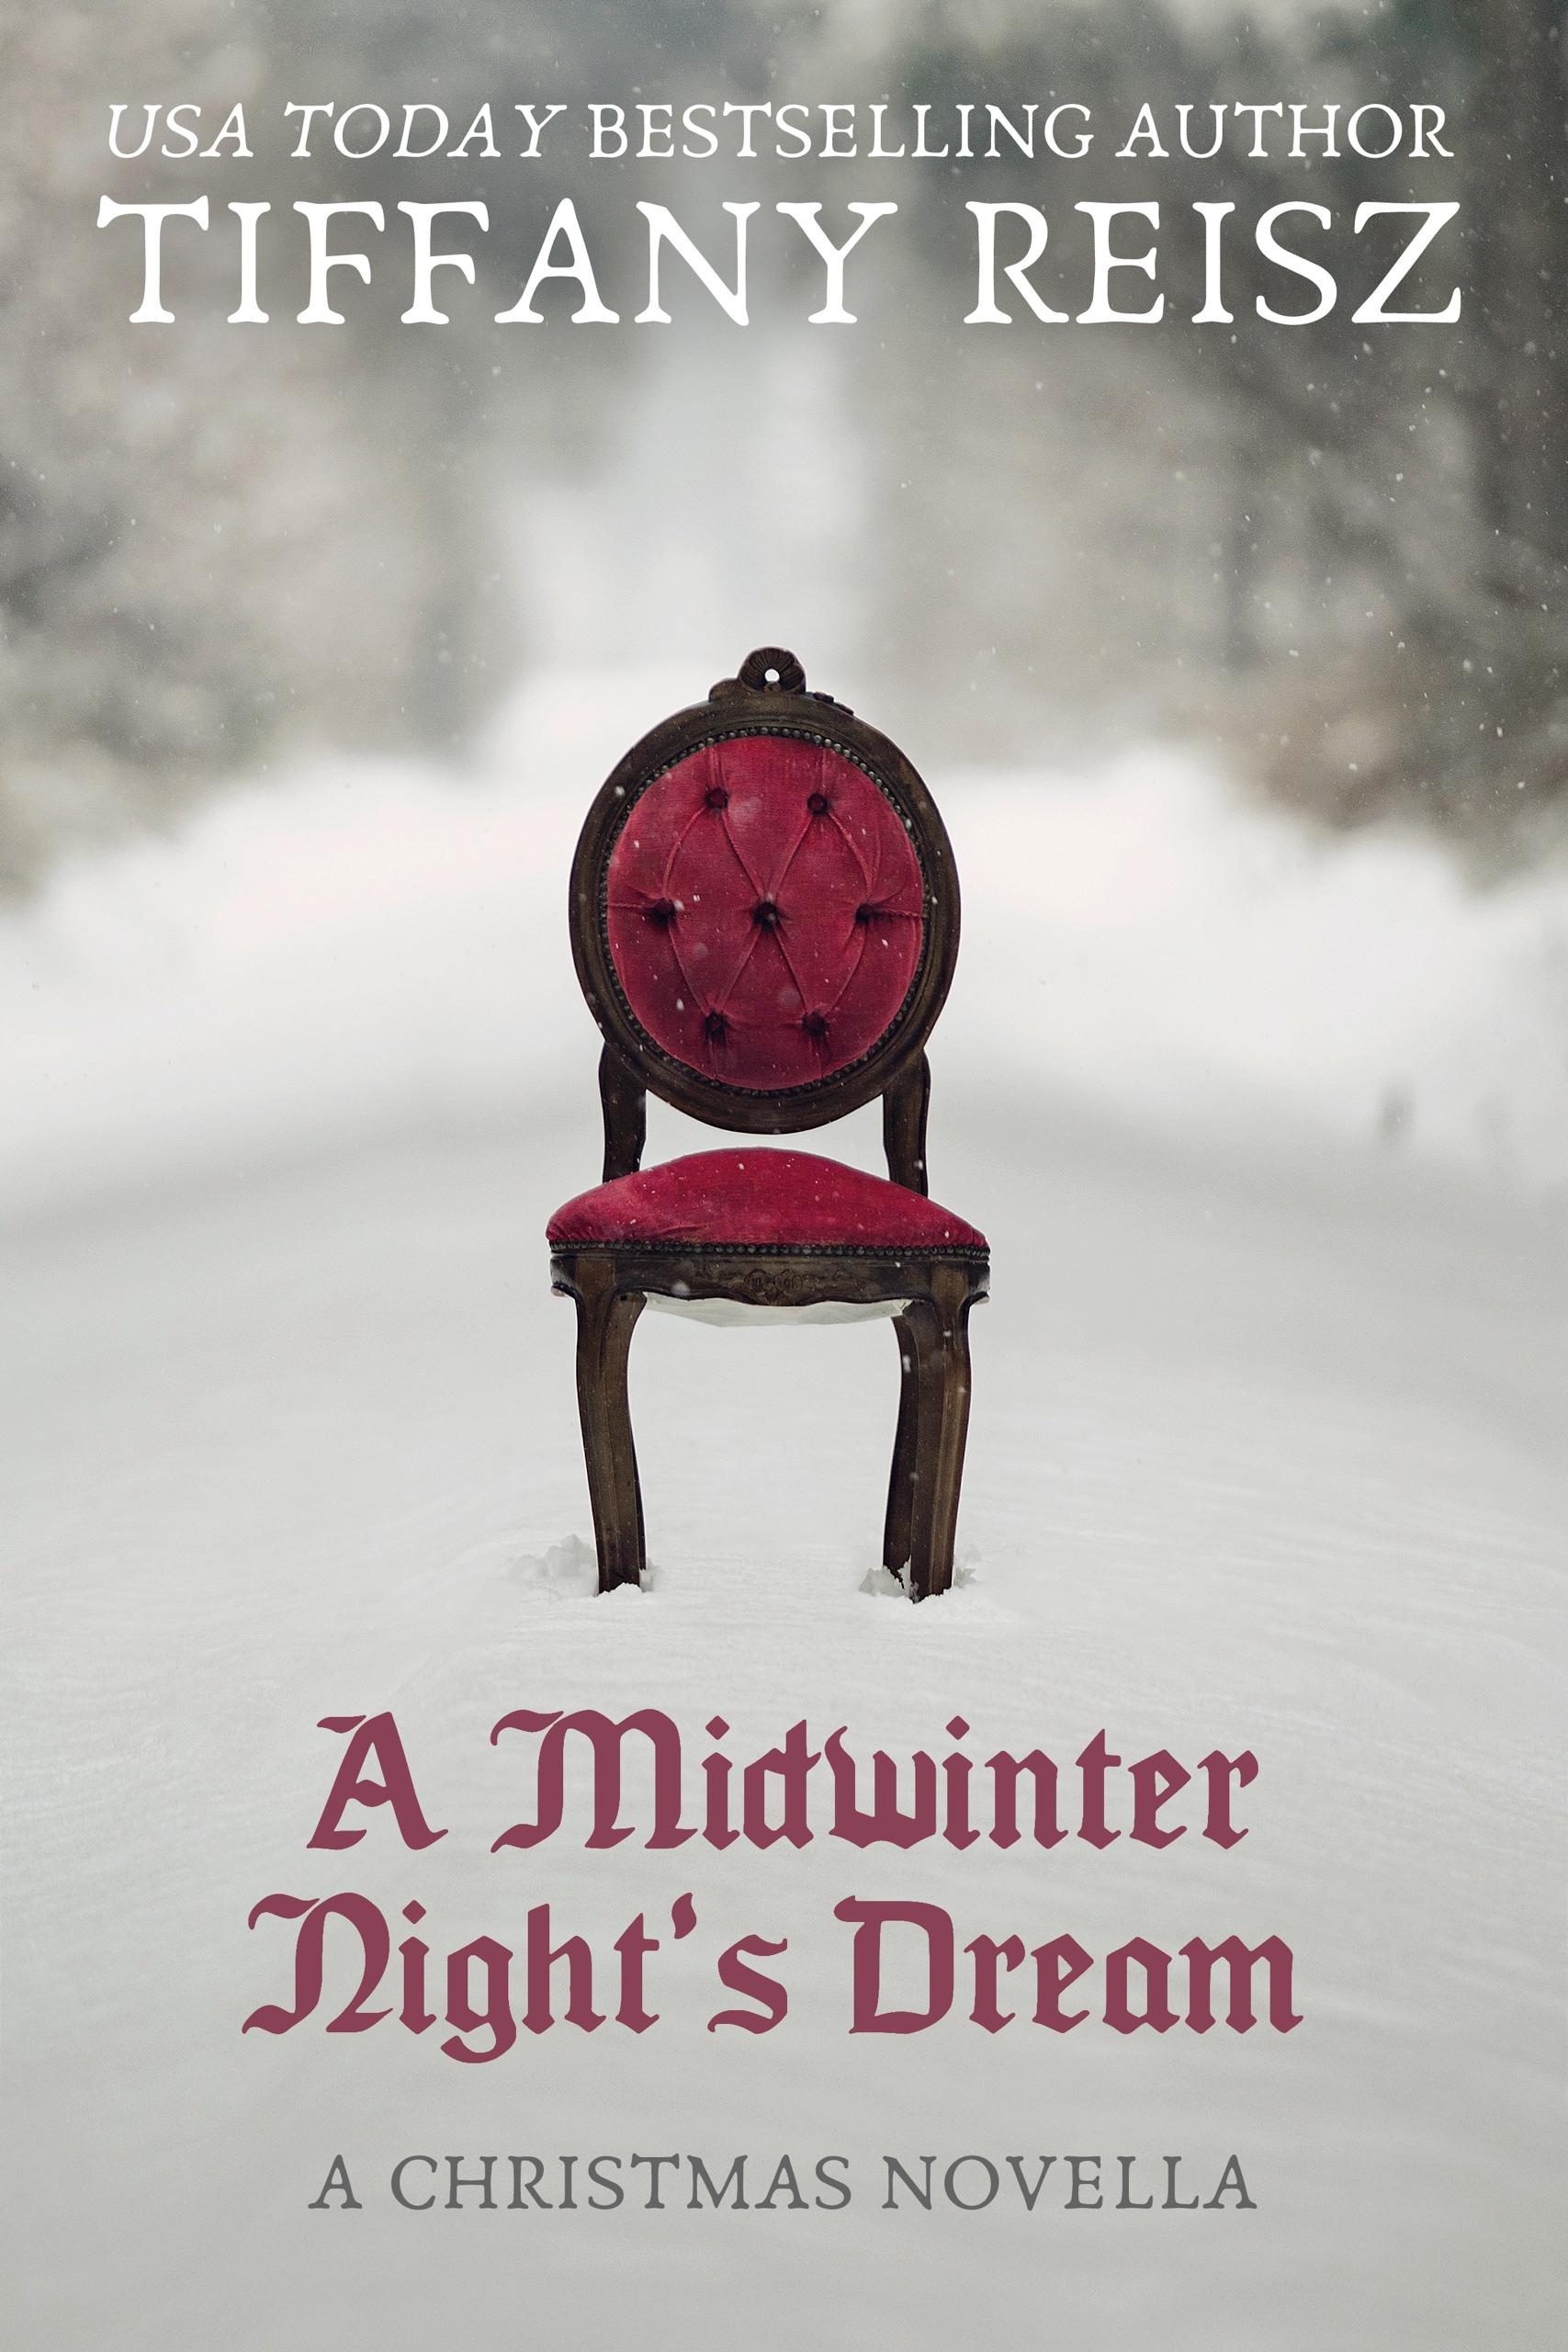 A-Midwinter-Nights-Dream-Google.jpg